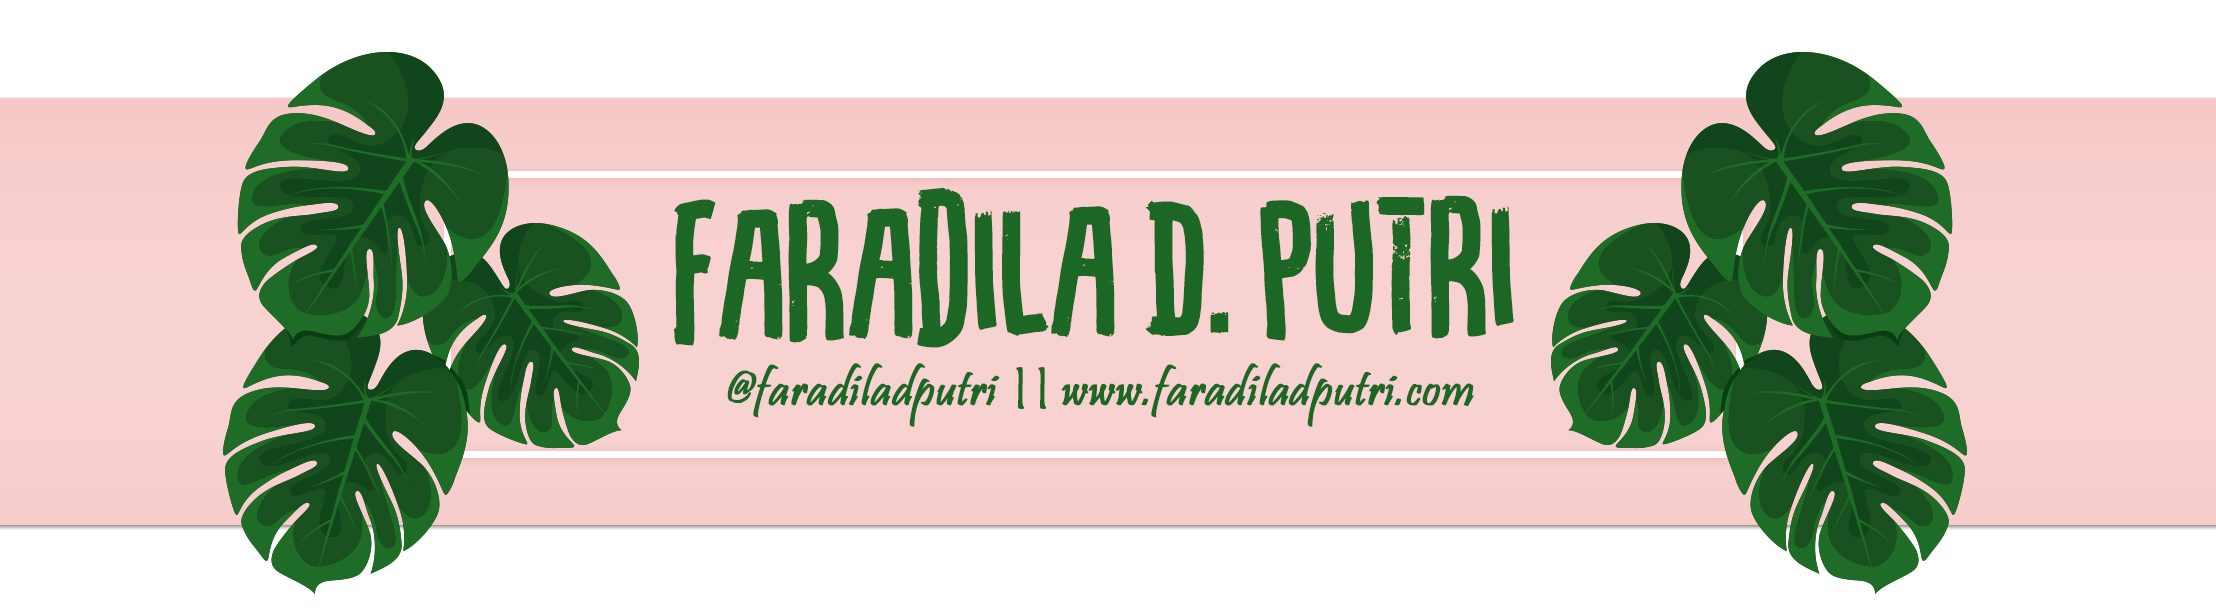 faradiladputri.com